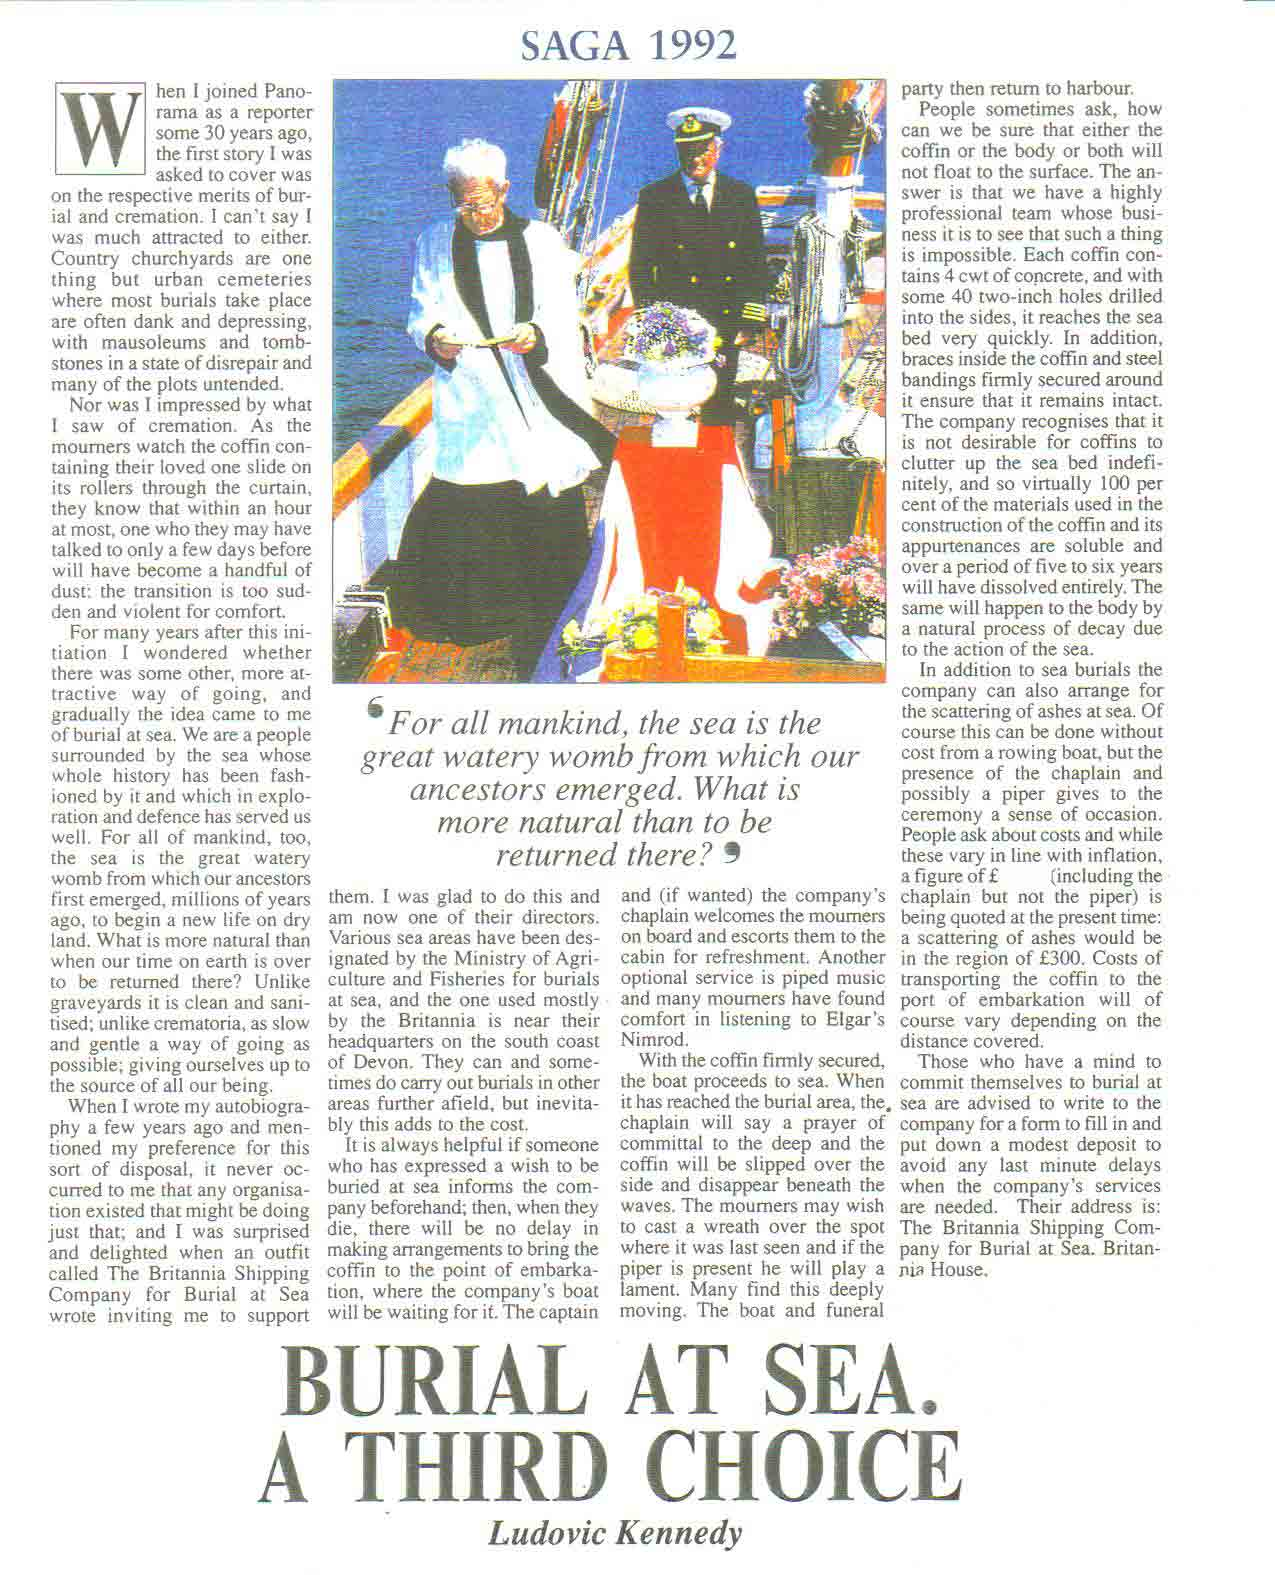 The Britannia Shipping Company Burial at Sea SAGA Editorial